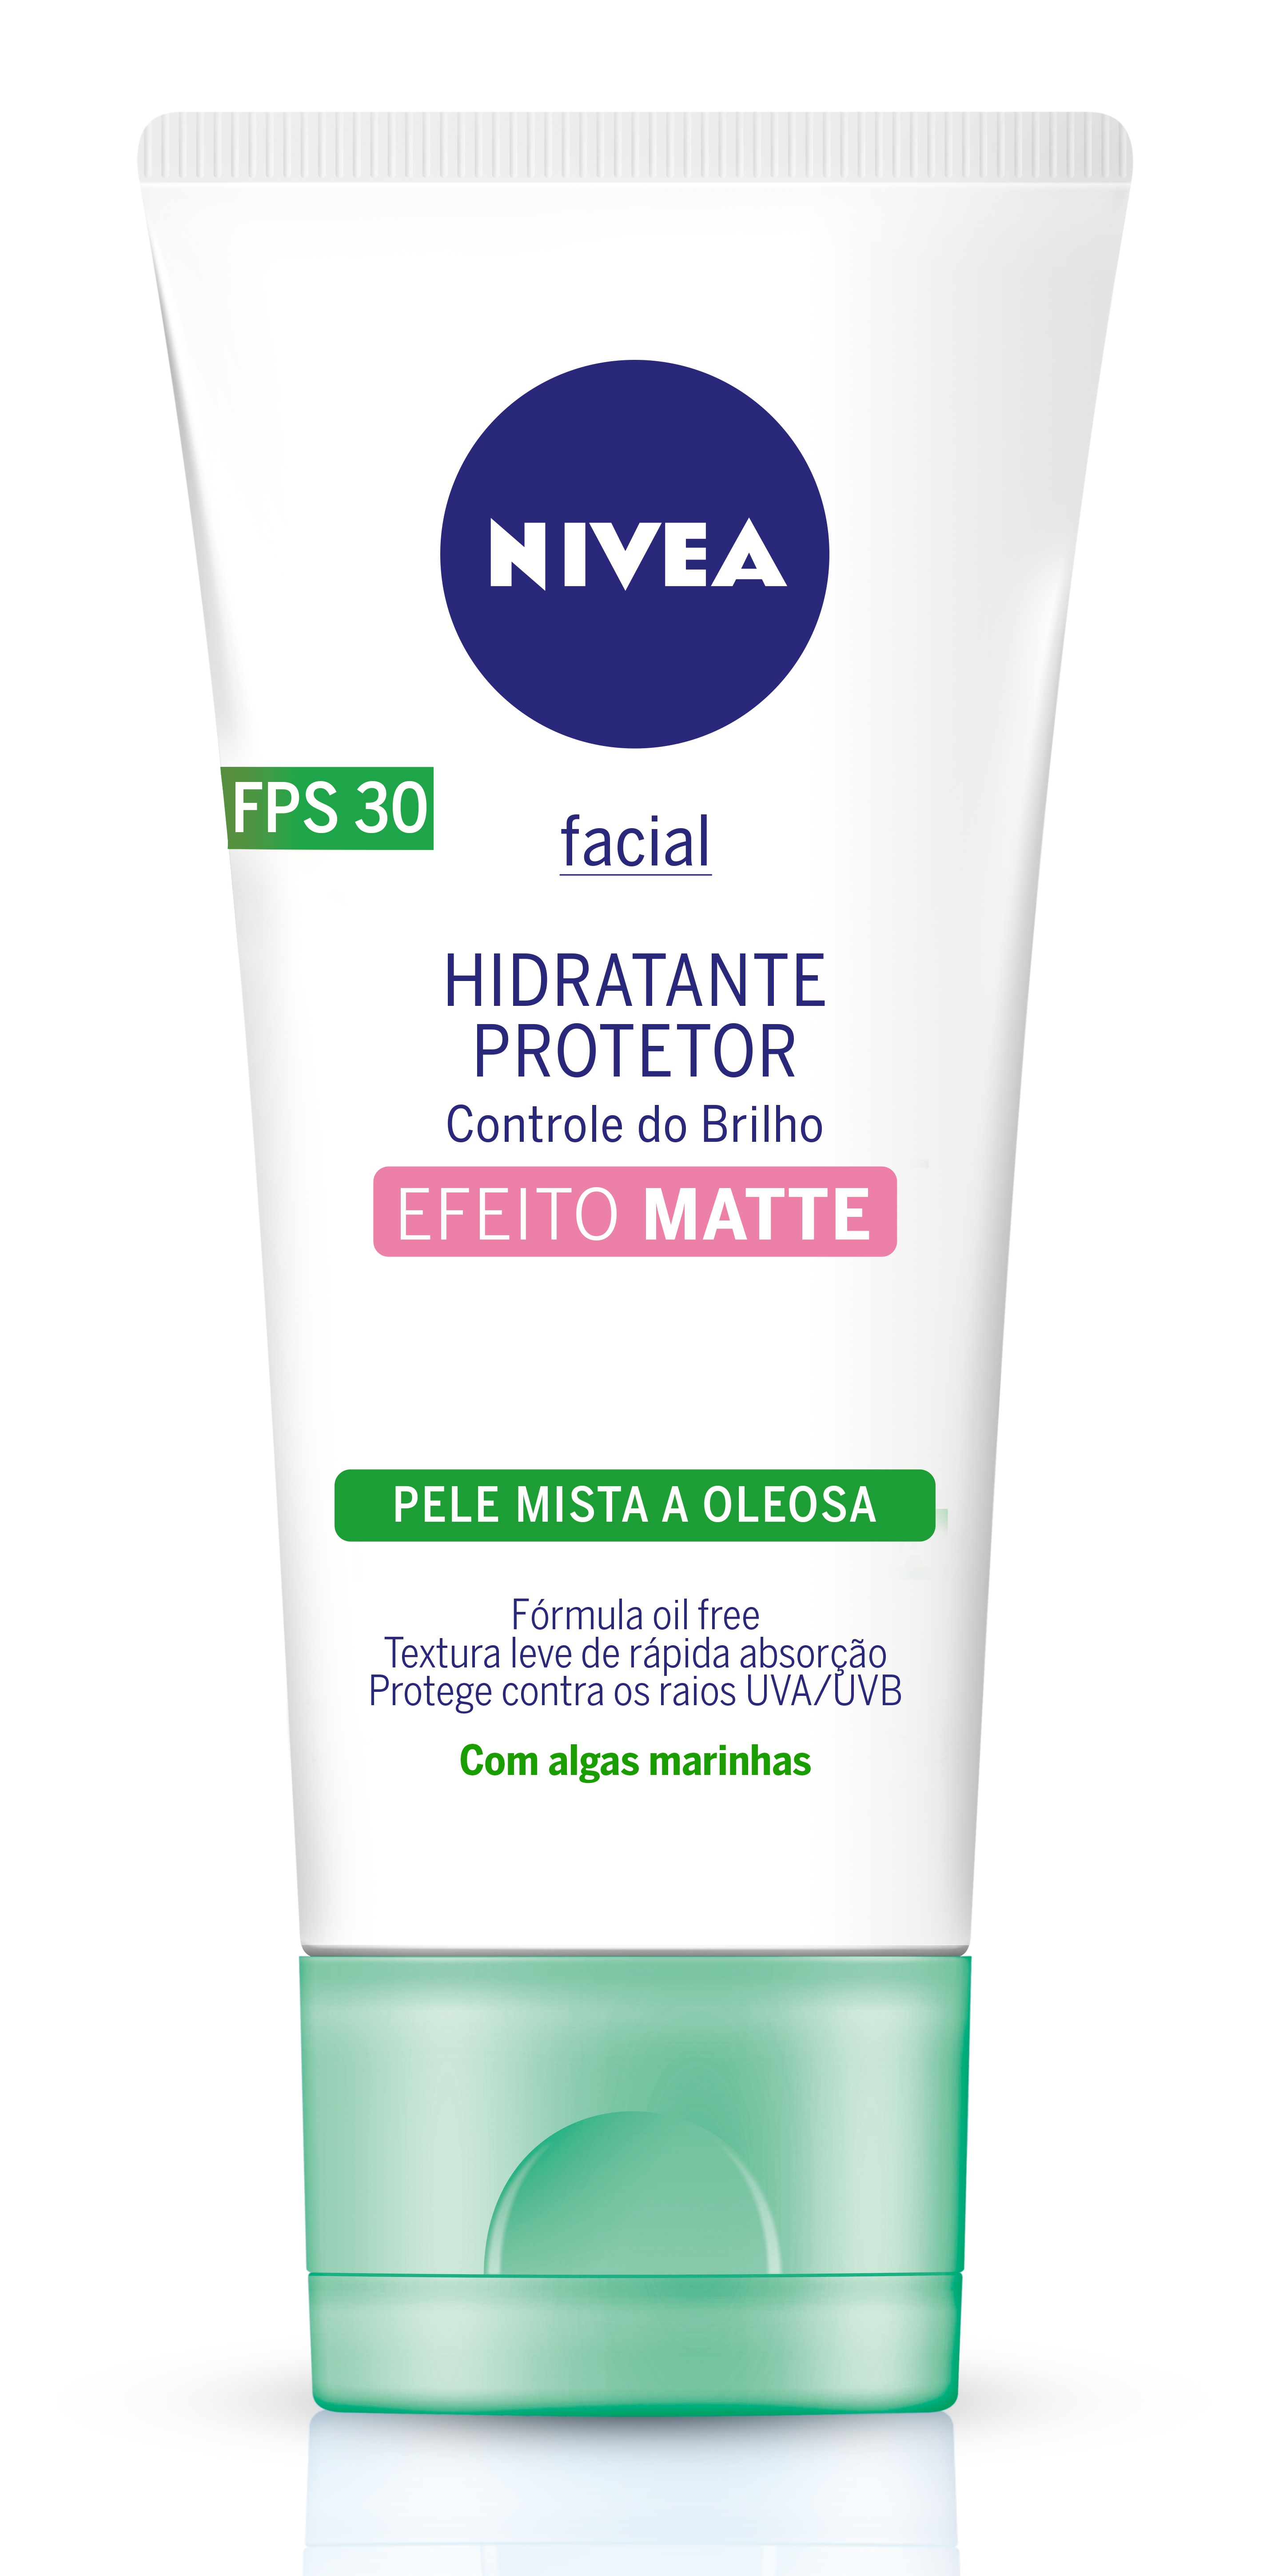 Nivea Hidratante Protetor Efeito Matte SPF 30